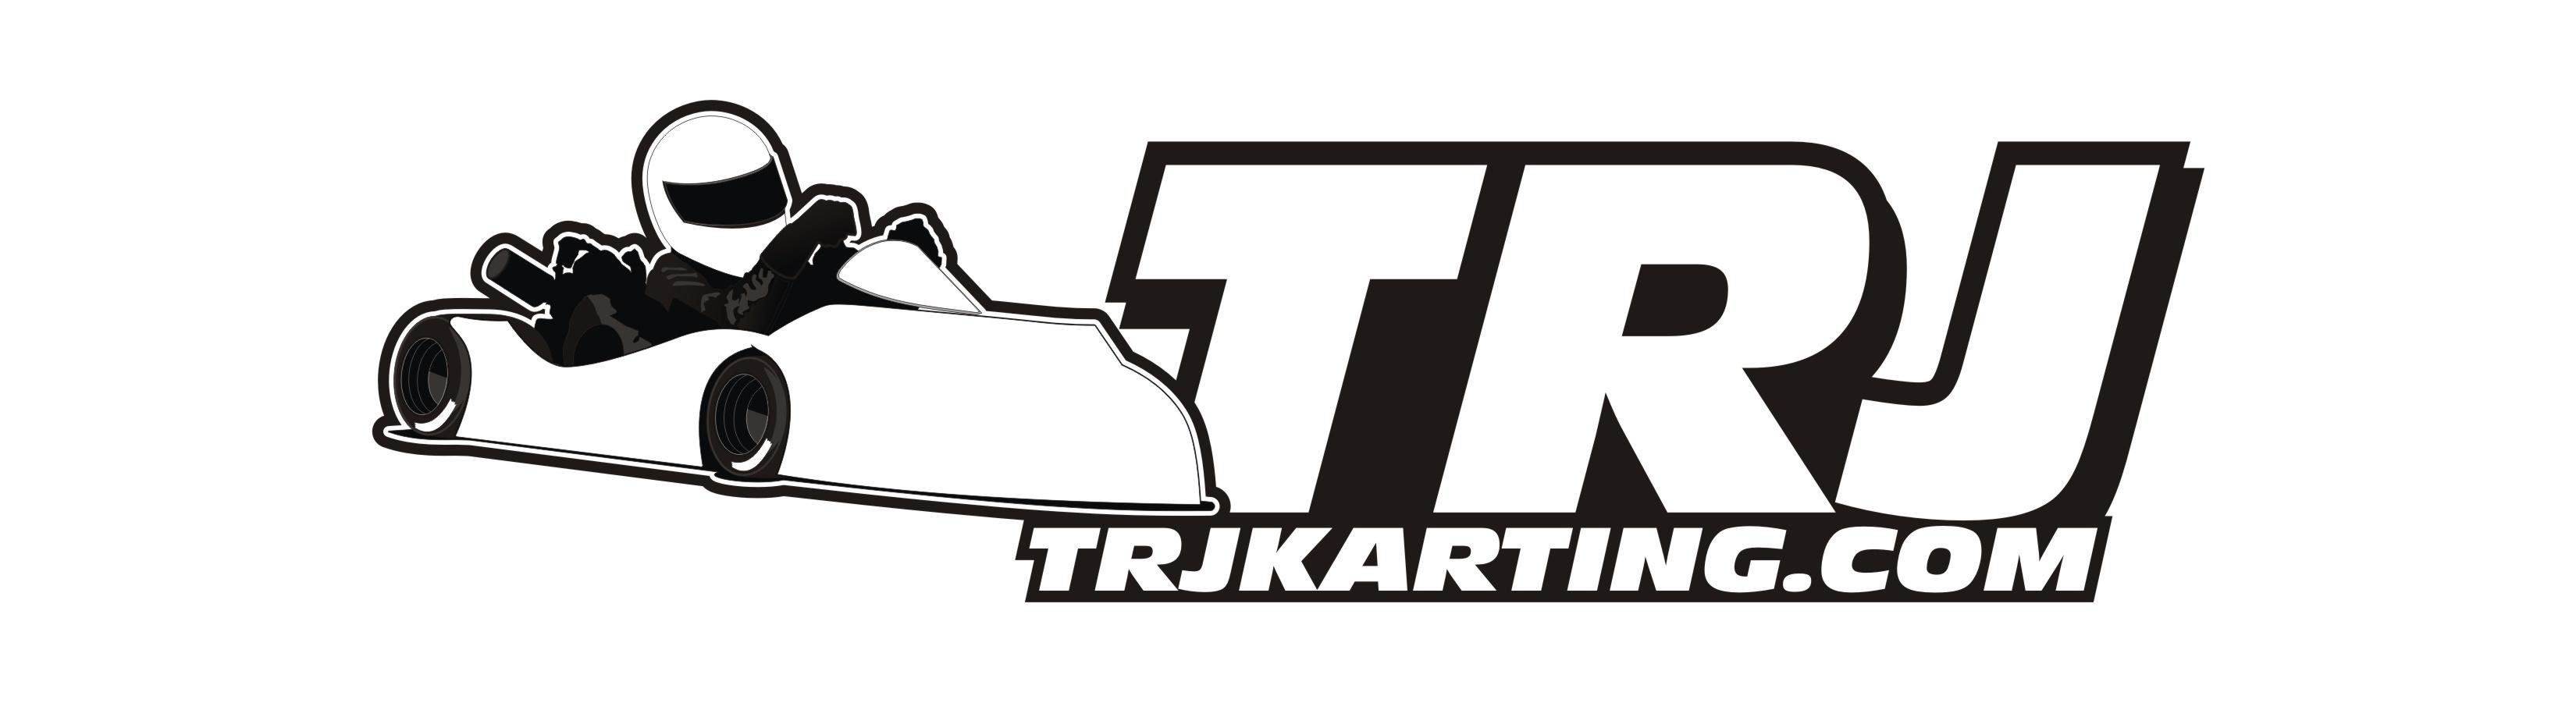 trj-karting-bw-com-v1-r0-1-.jpg